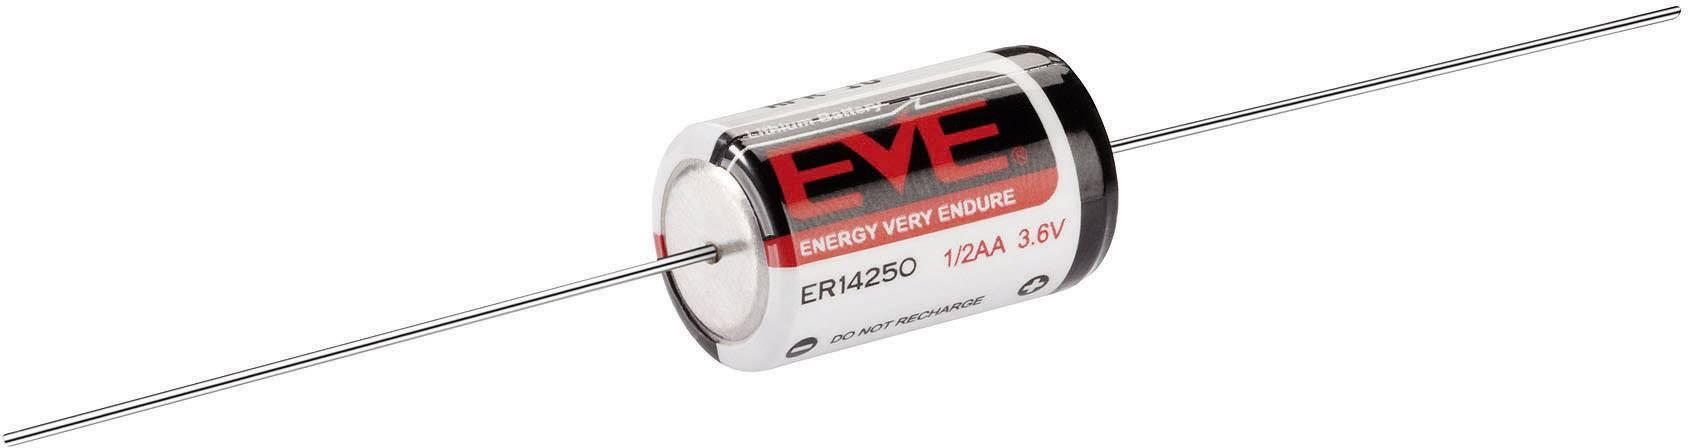 Lithiová batéria EVE, 1/2 AA s pájkovacímy pinmi, 1200 mAh